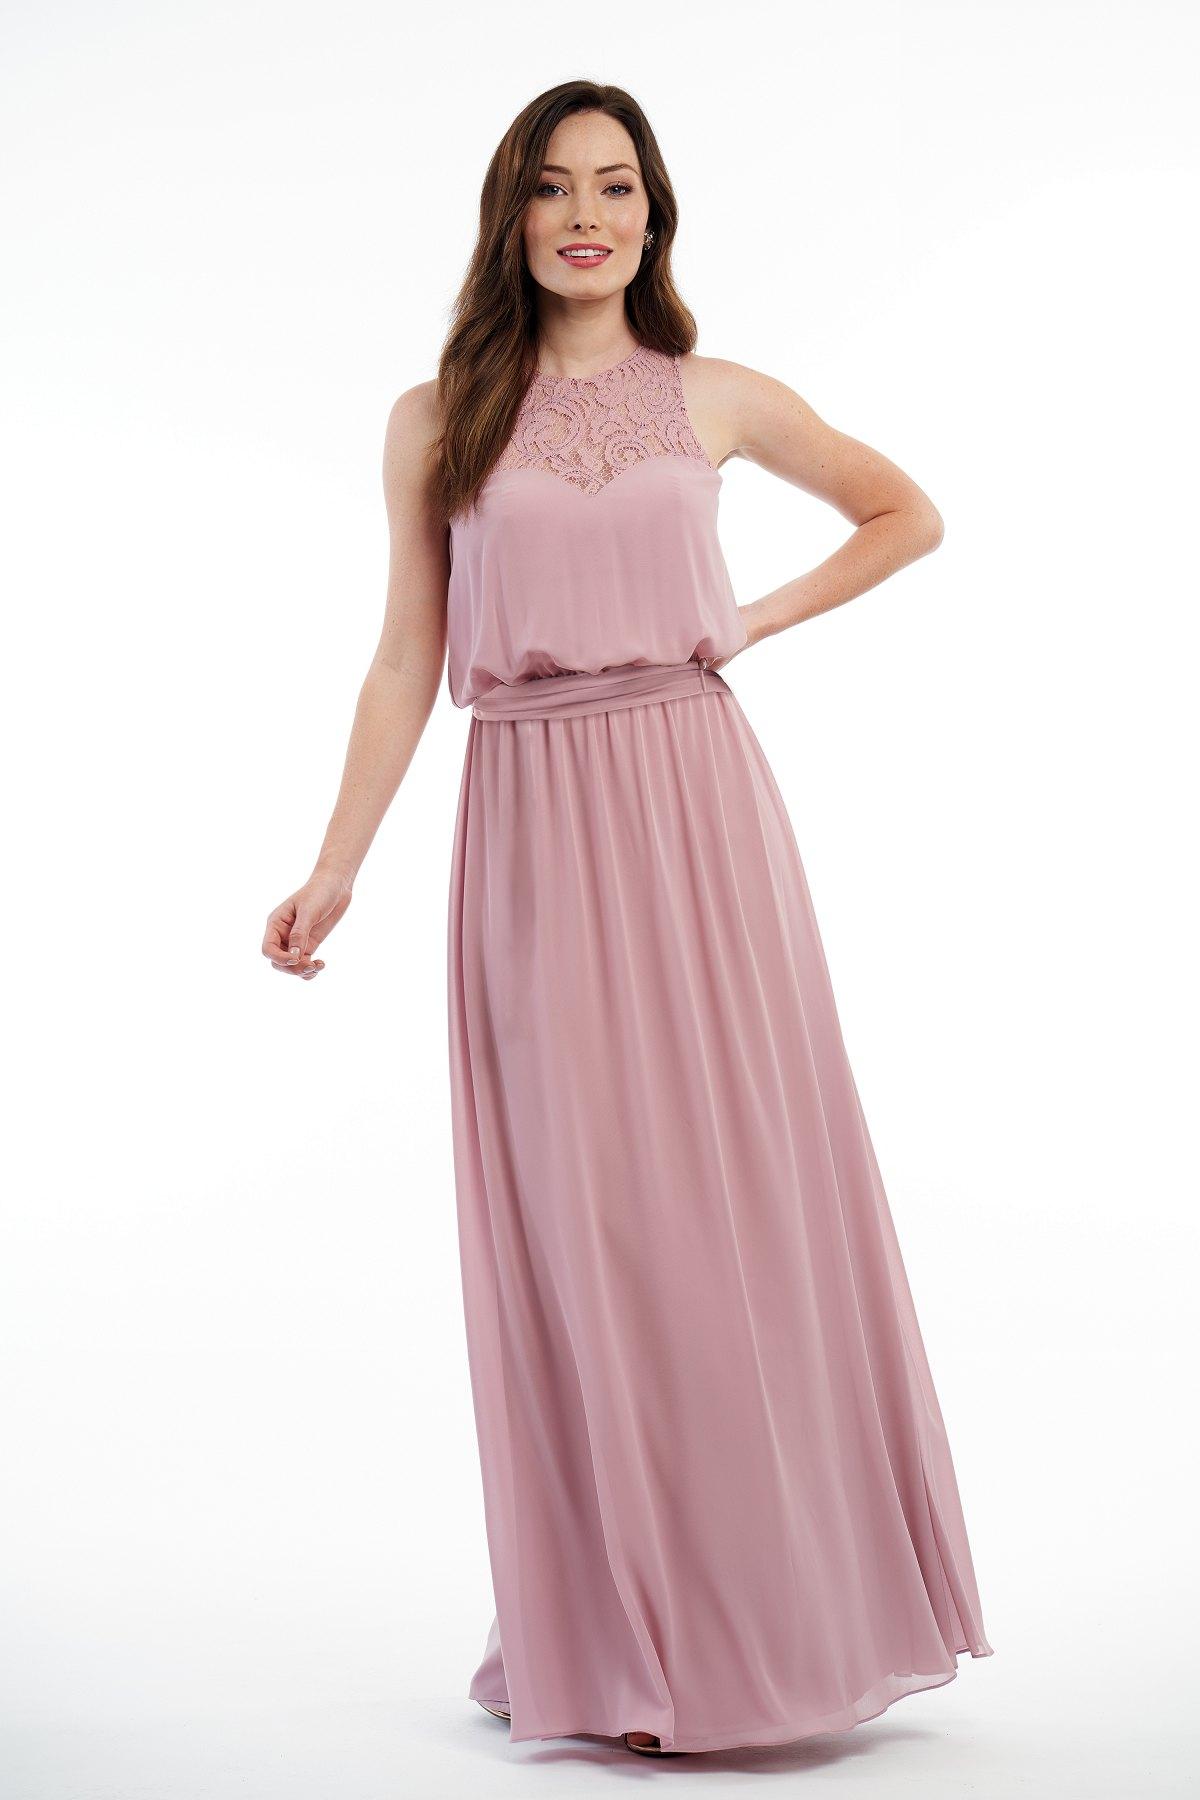 02eba6cc7da0 P216010 Charlotte Chiffon & Lace Long Bridesmaid Dress with Jewel Neckline